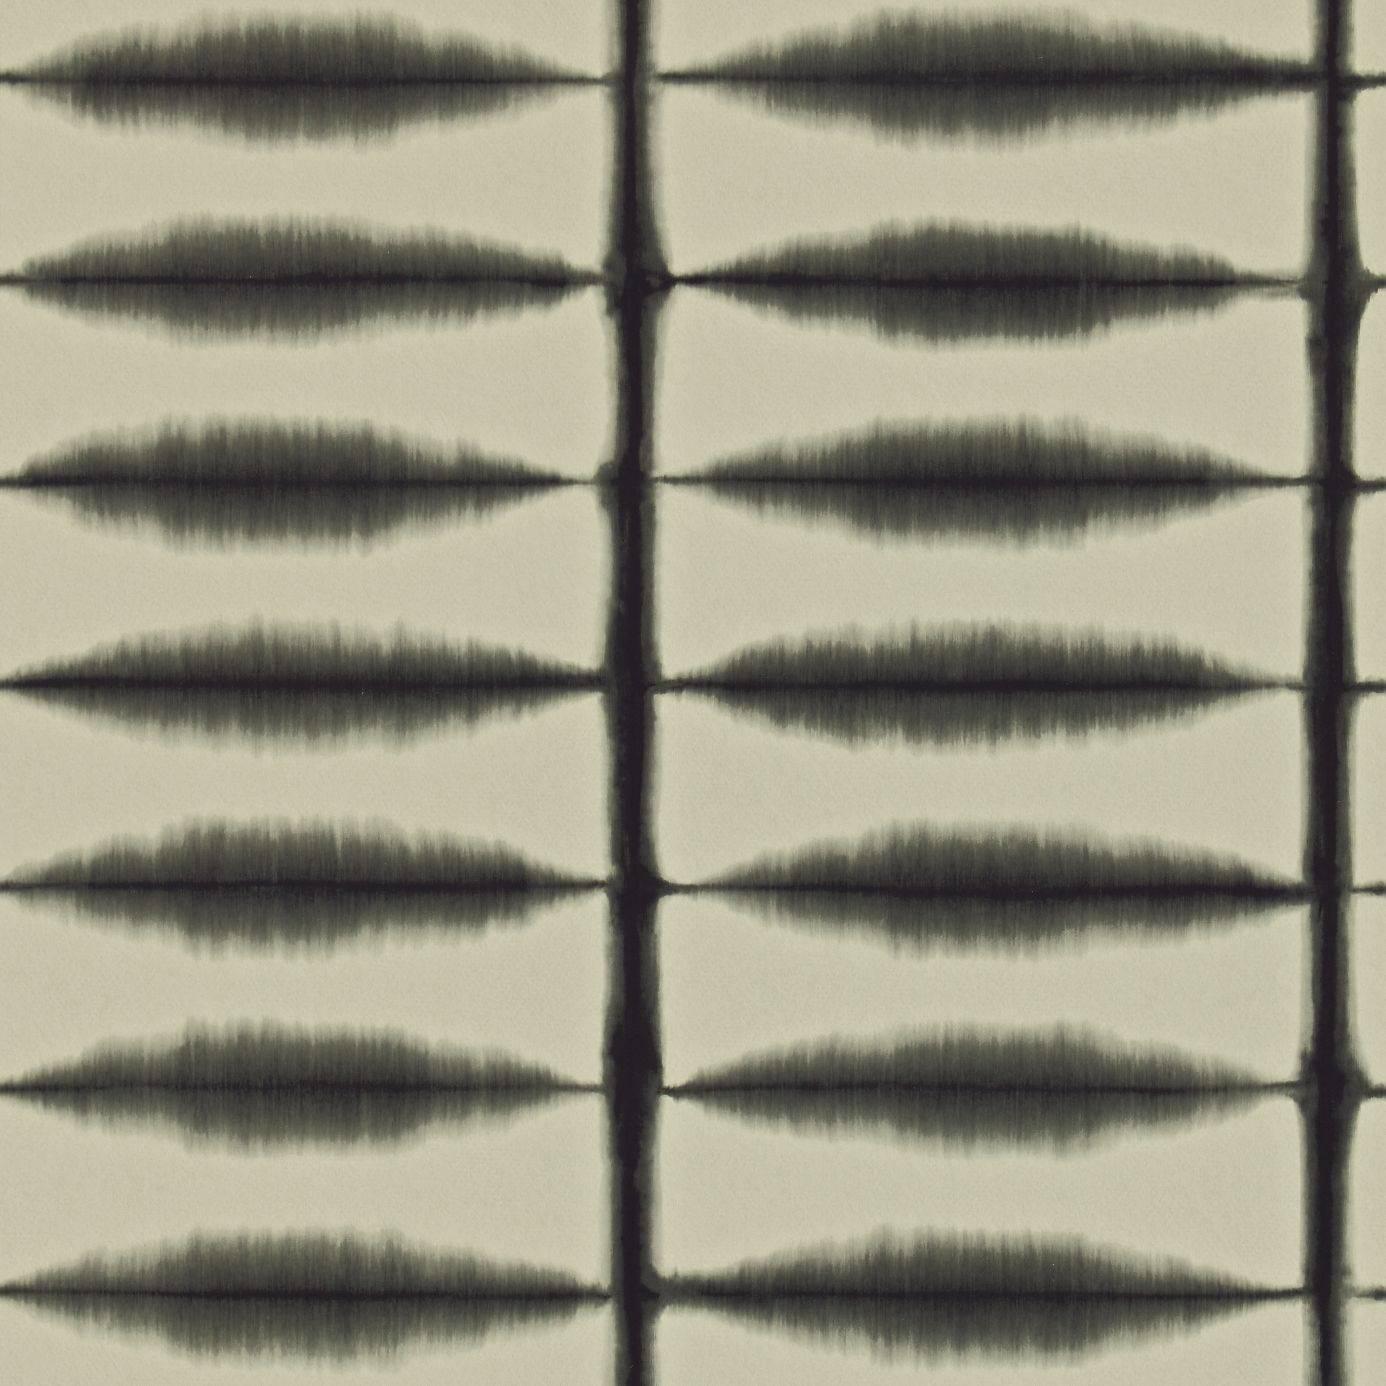 Scion Wabi Sabi Wallpapers Shibori Wallpaper - Graphite - 110439. Loading zoom